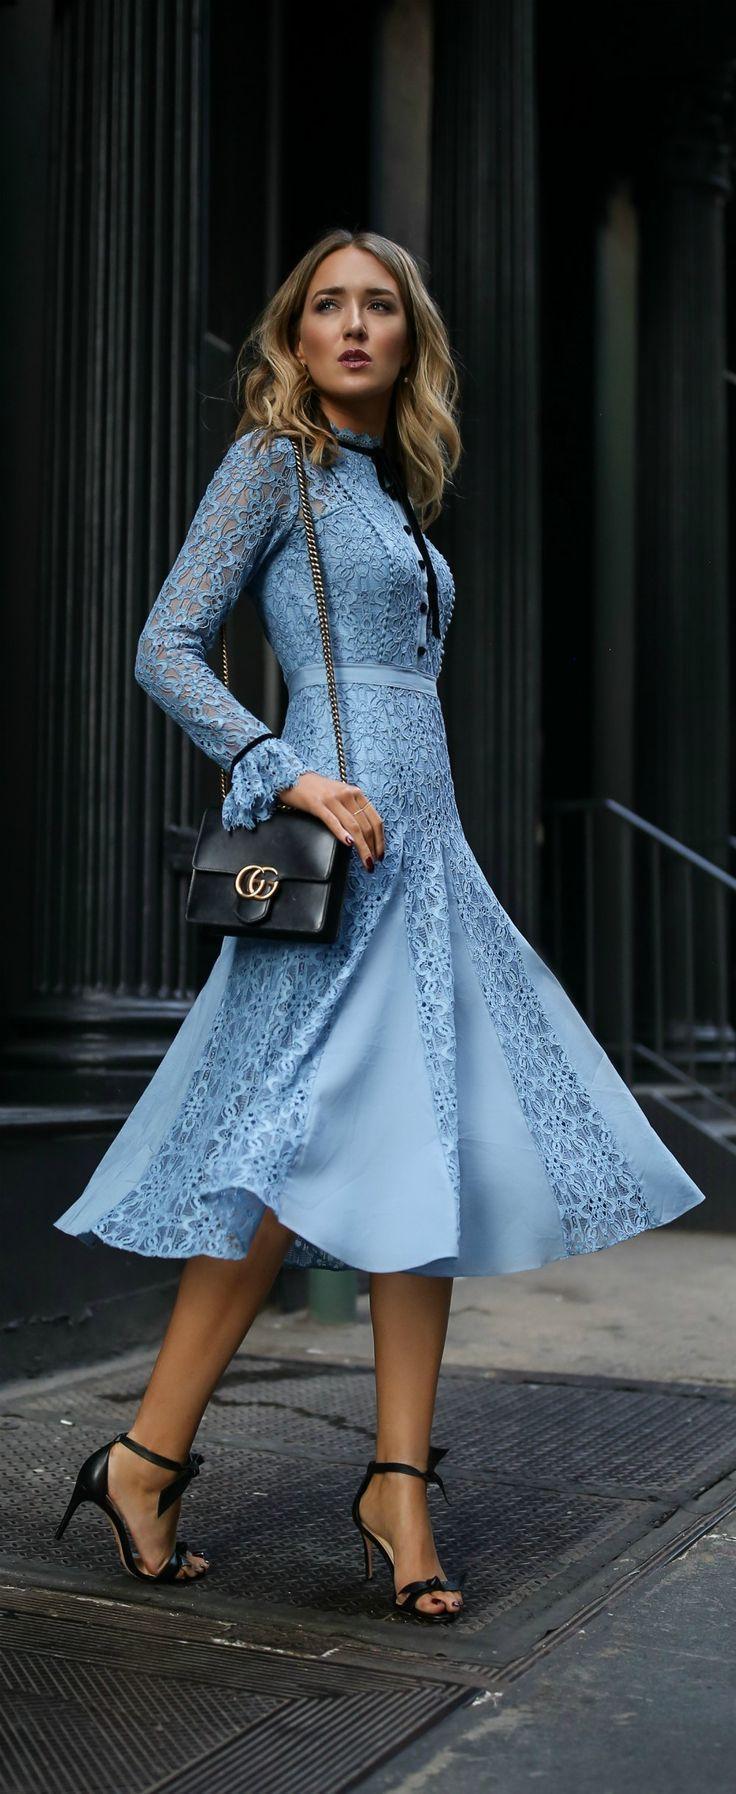 Click for outfit details! // Blue lace dress, black ankle strap bow heels, black crossbody handbag {Alexandre Birman, Gucci, baby shower, weekend wear} #anklestrapsheelschic #anklestrapsheelsoutfit